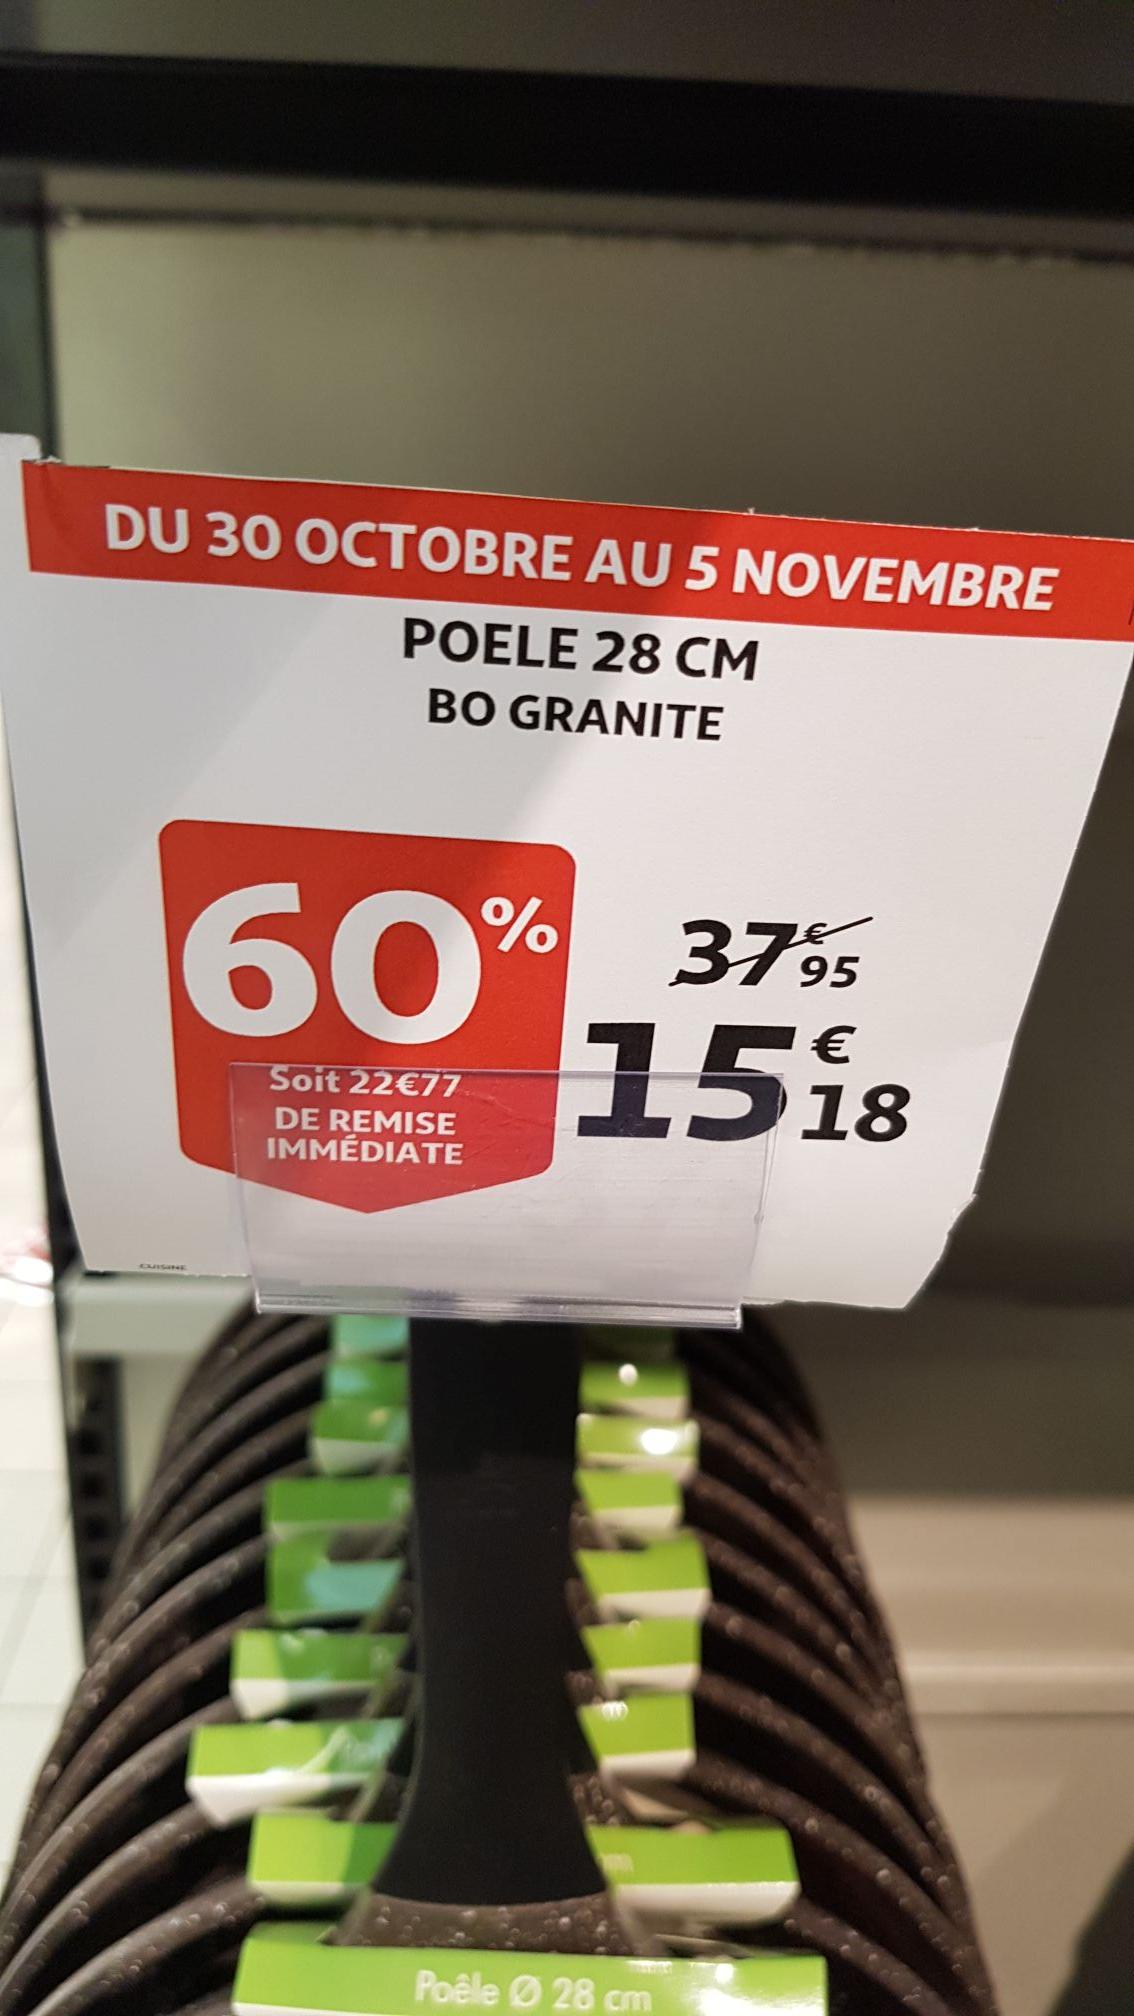 Poele/Faitout/sauteuse/crepiere BO Granite - Auchan Dardilly (69)